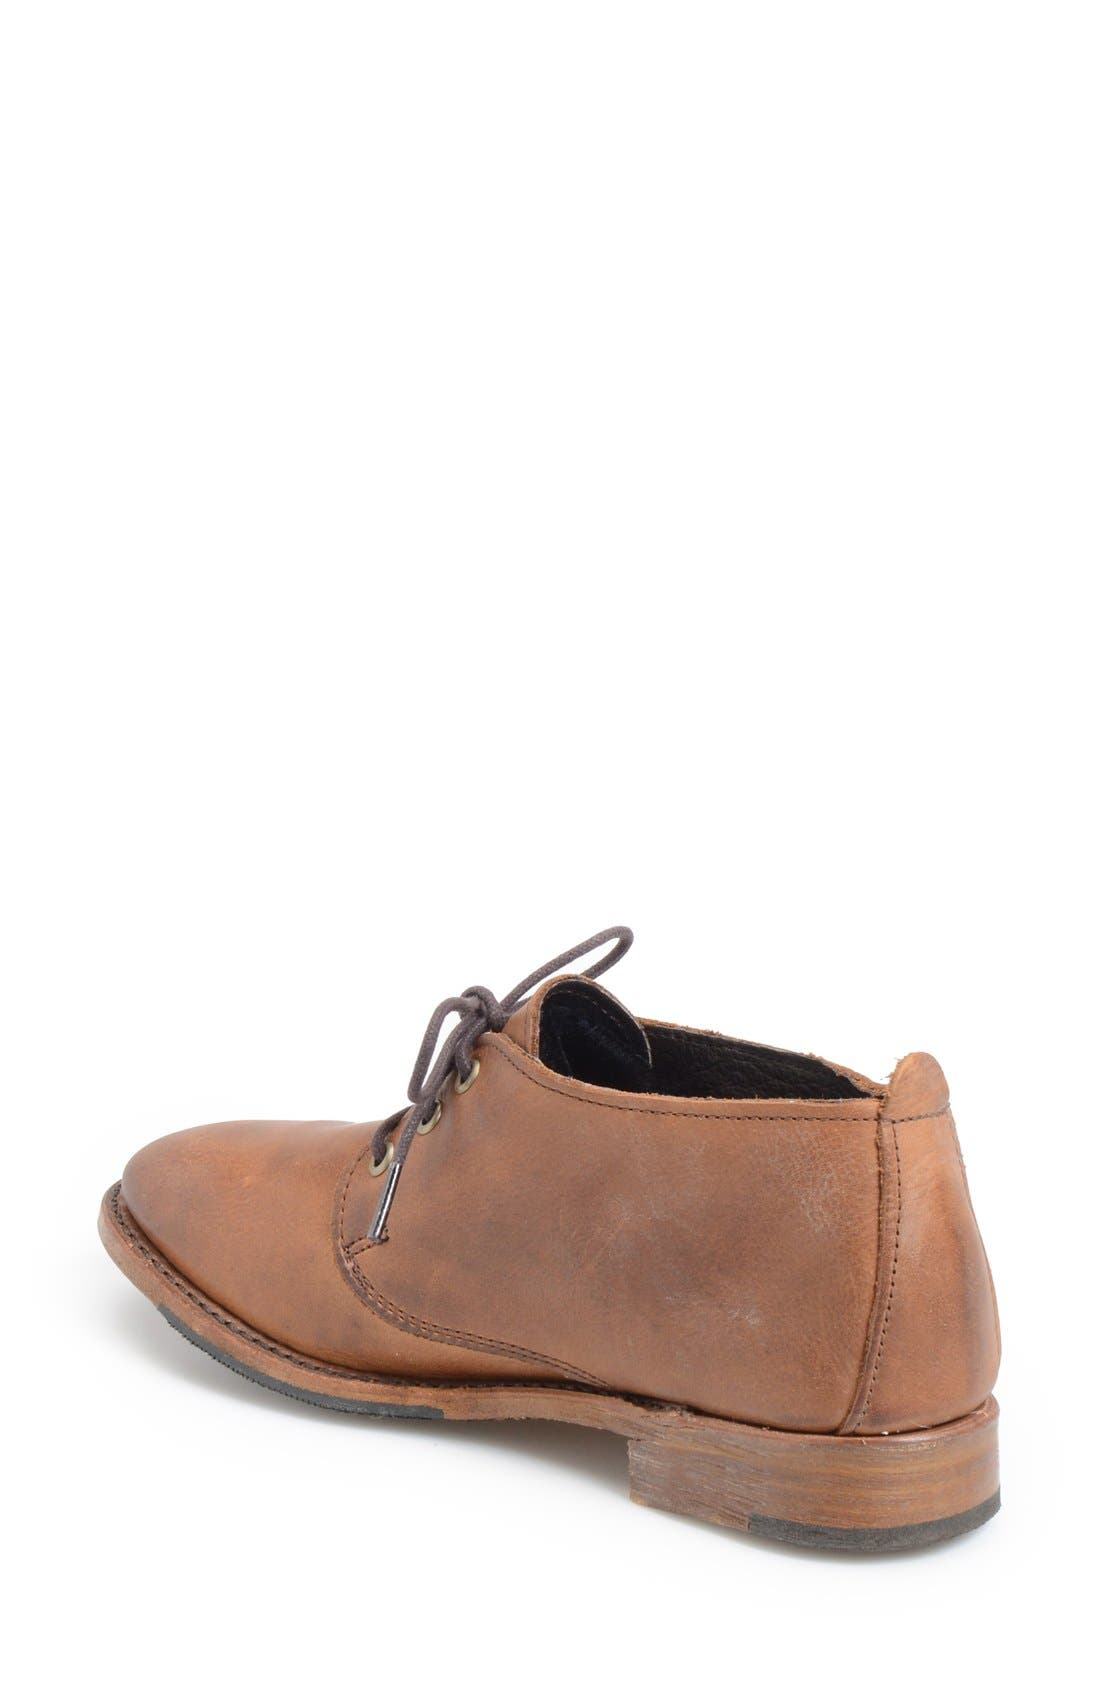 Alternate Image 2  - Vintage Shoe Company 'Ansley' Chukka Boot (Women)